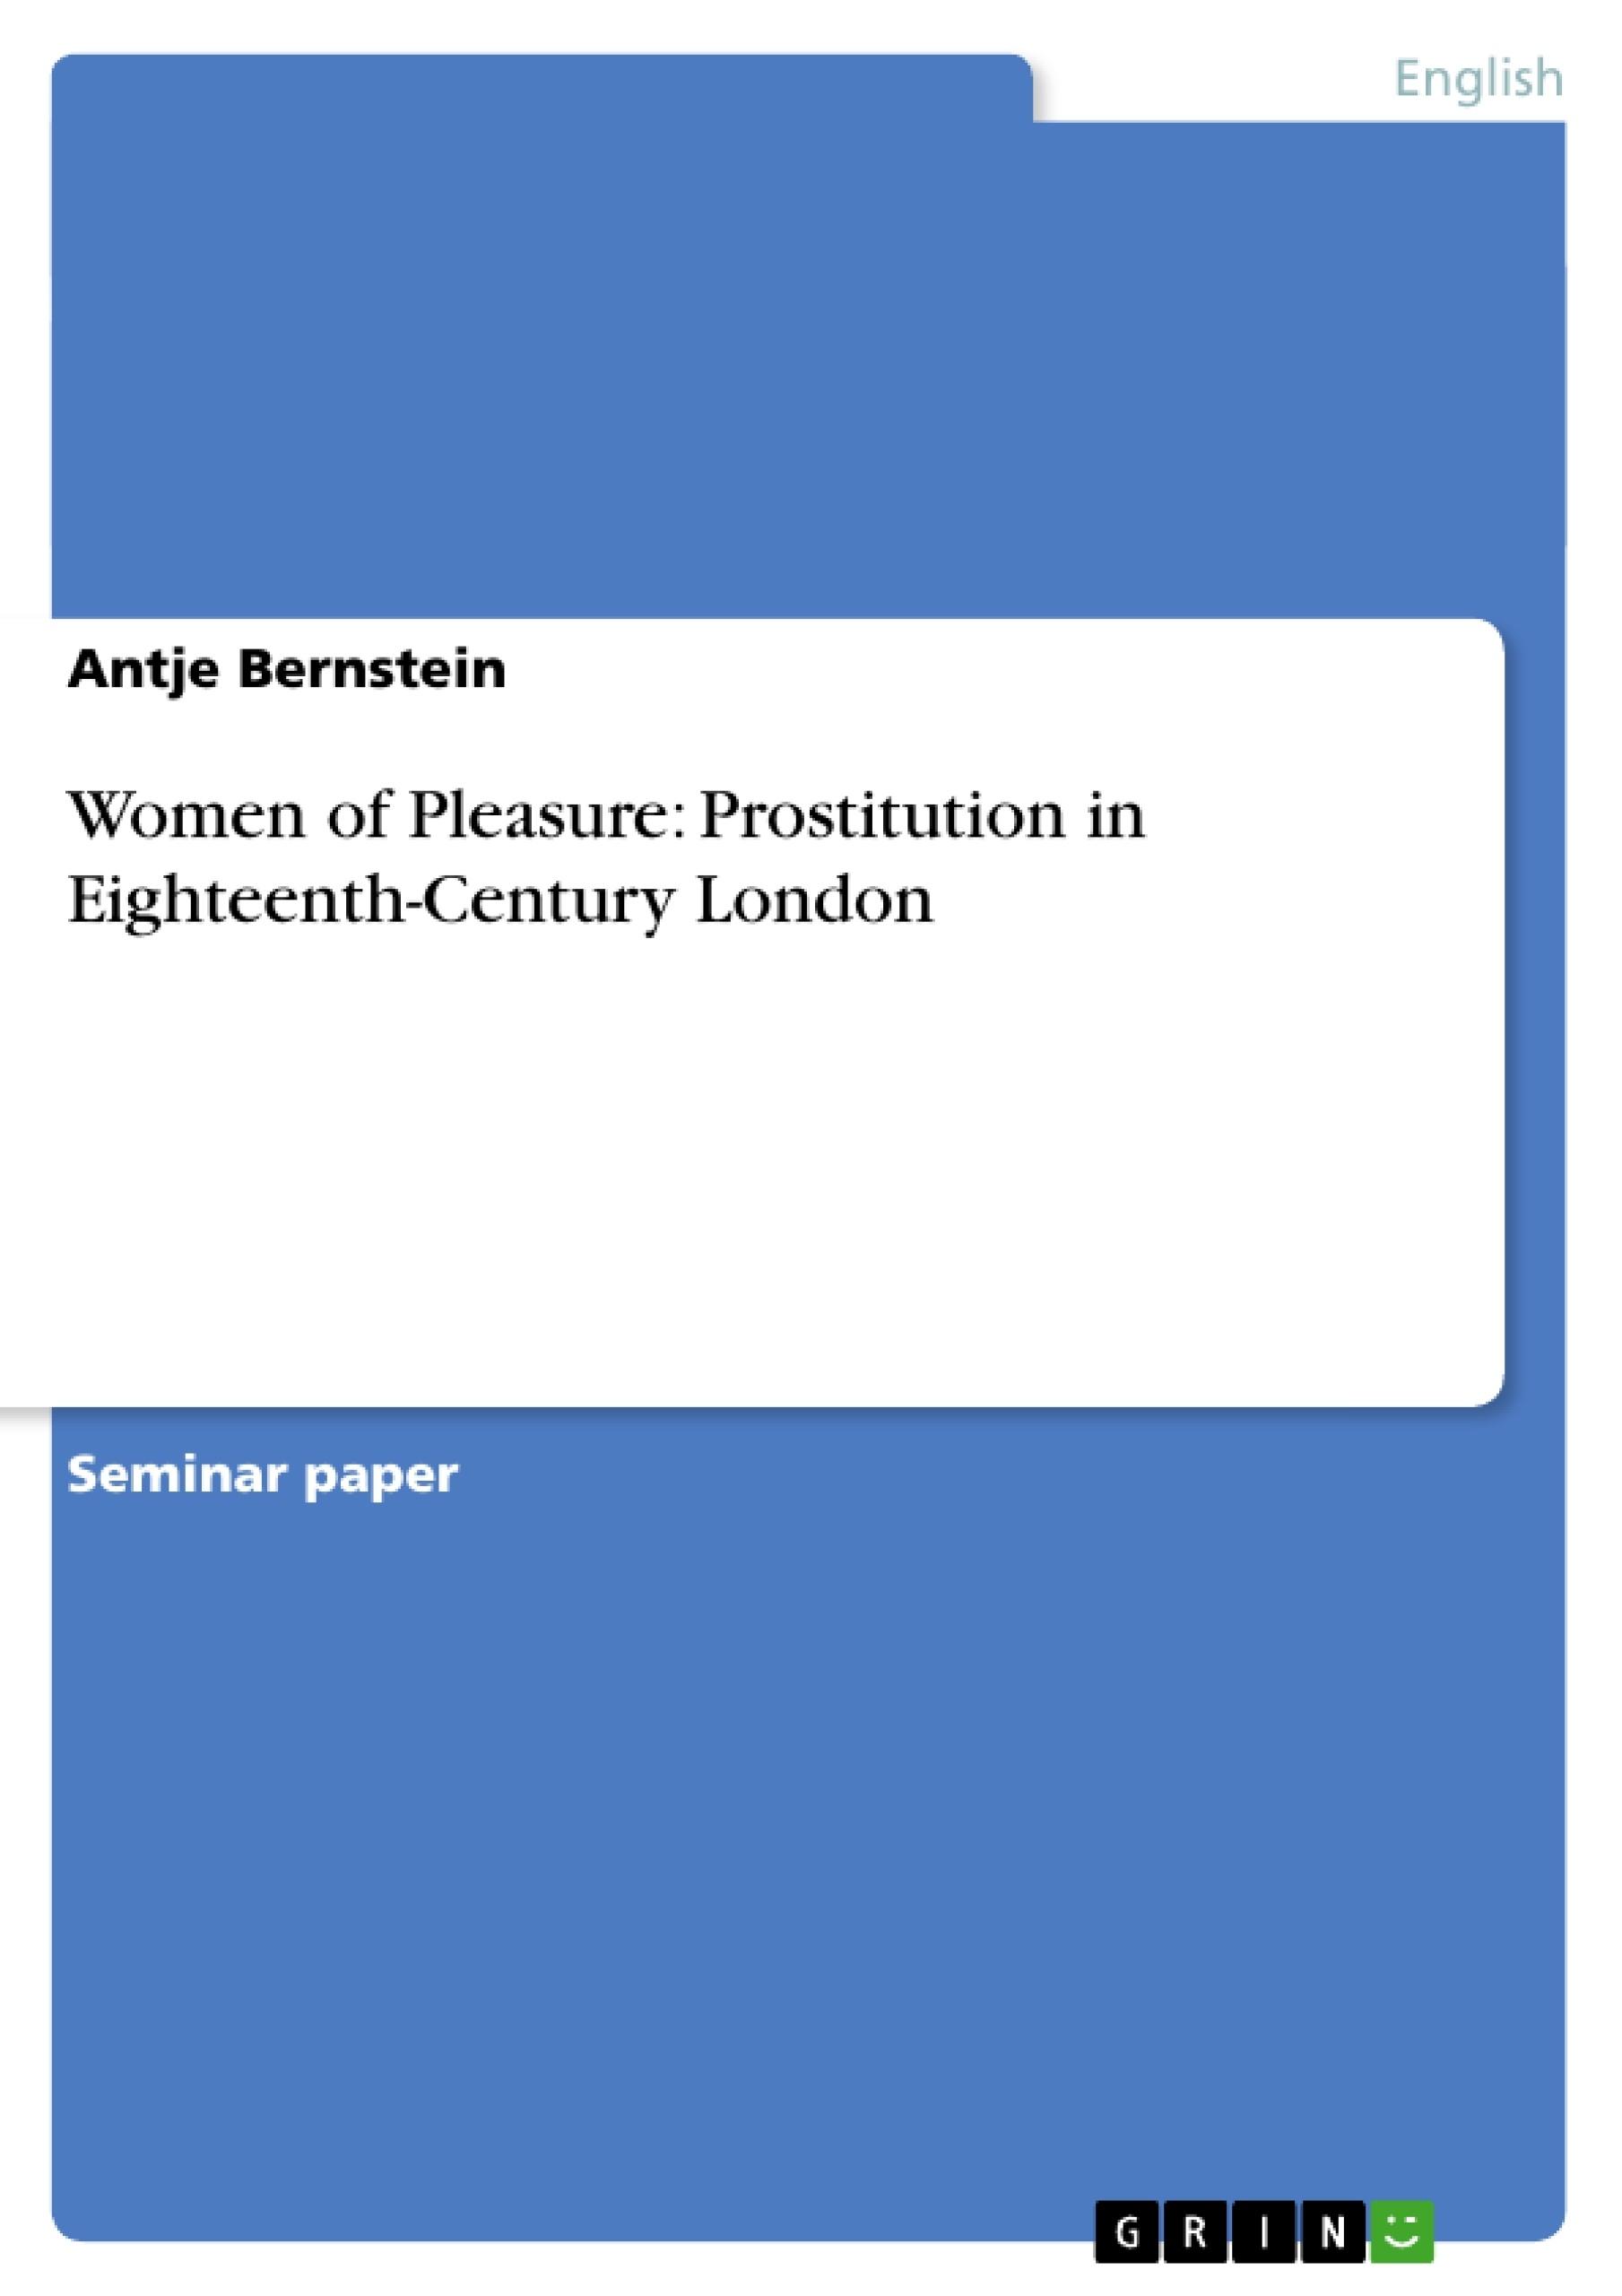 Title: Women of Pleasure: Prostitution in Eighteenth-Century London